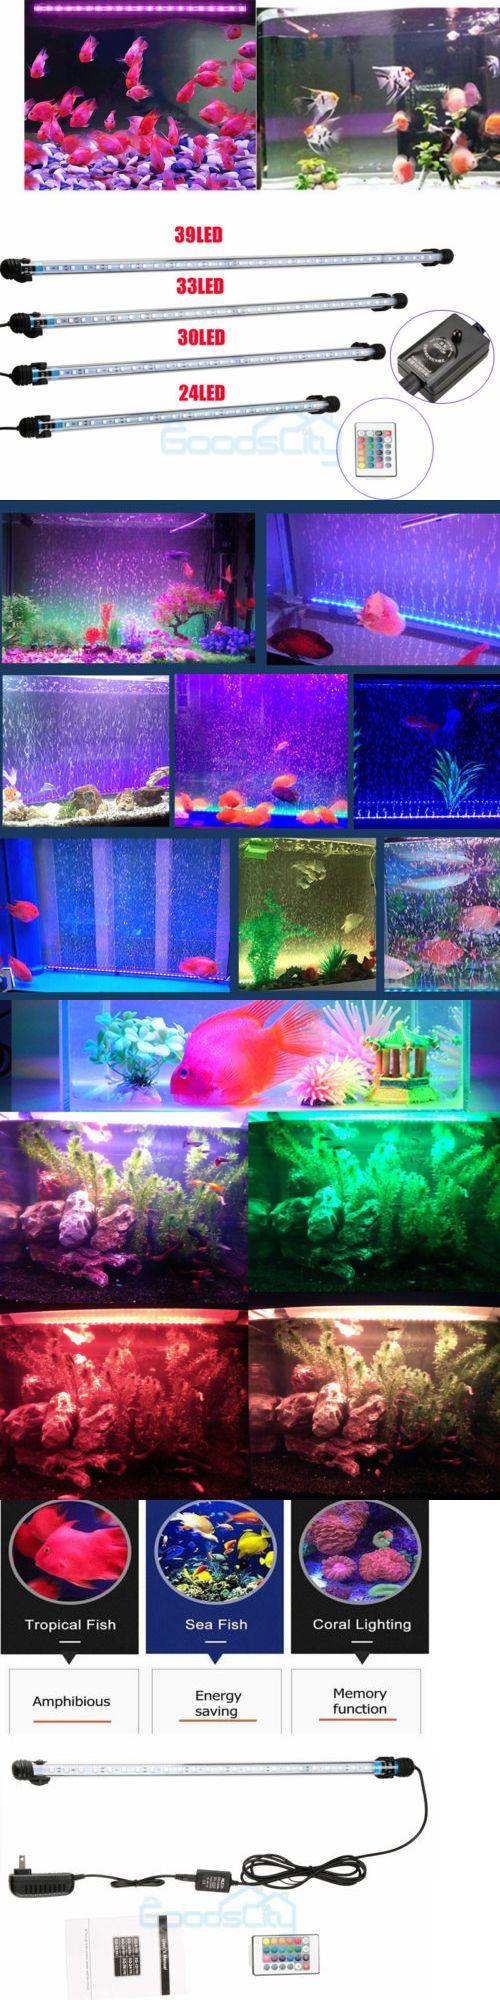 Rgb Led Fish Tank Light Aquarium Waterproof Bar Submersible Lamp Remote Control Fish Tank Lights Fish Tank Rgb Led